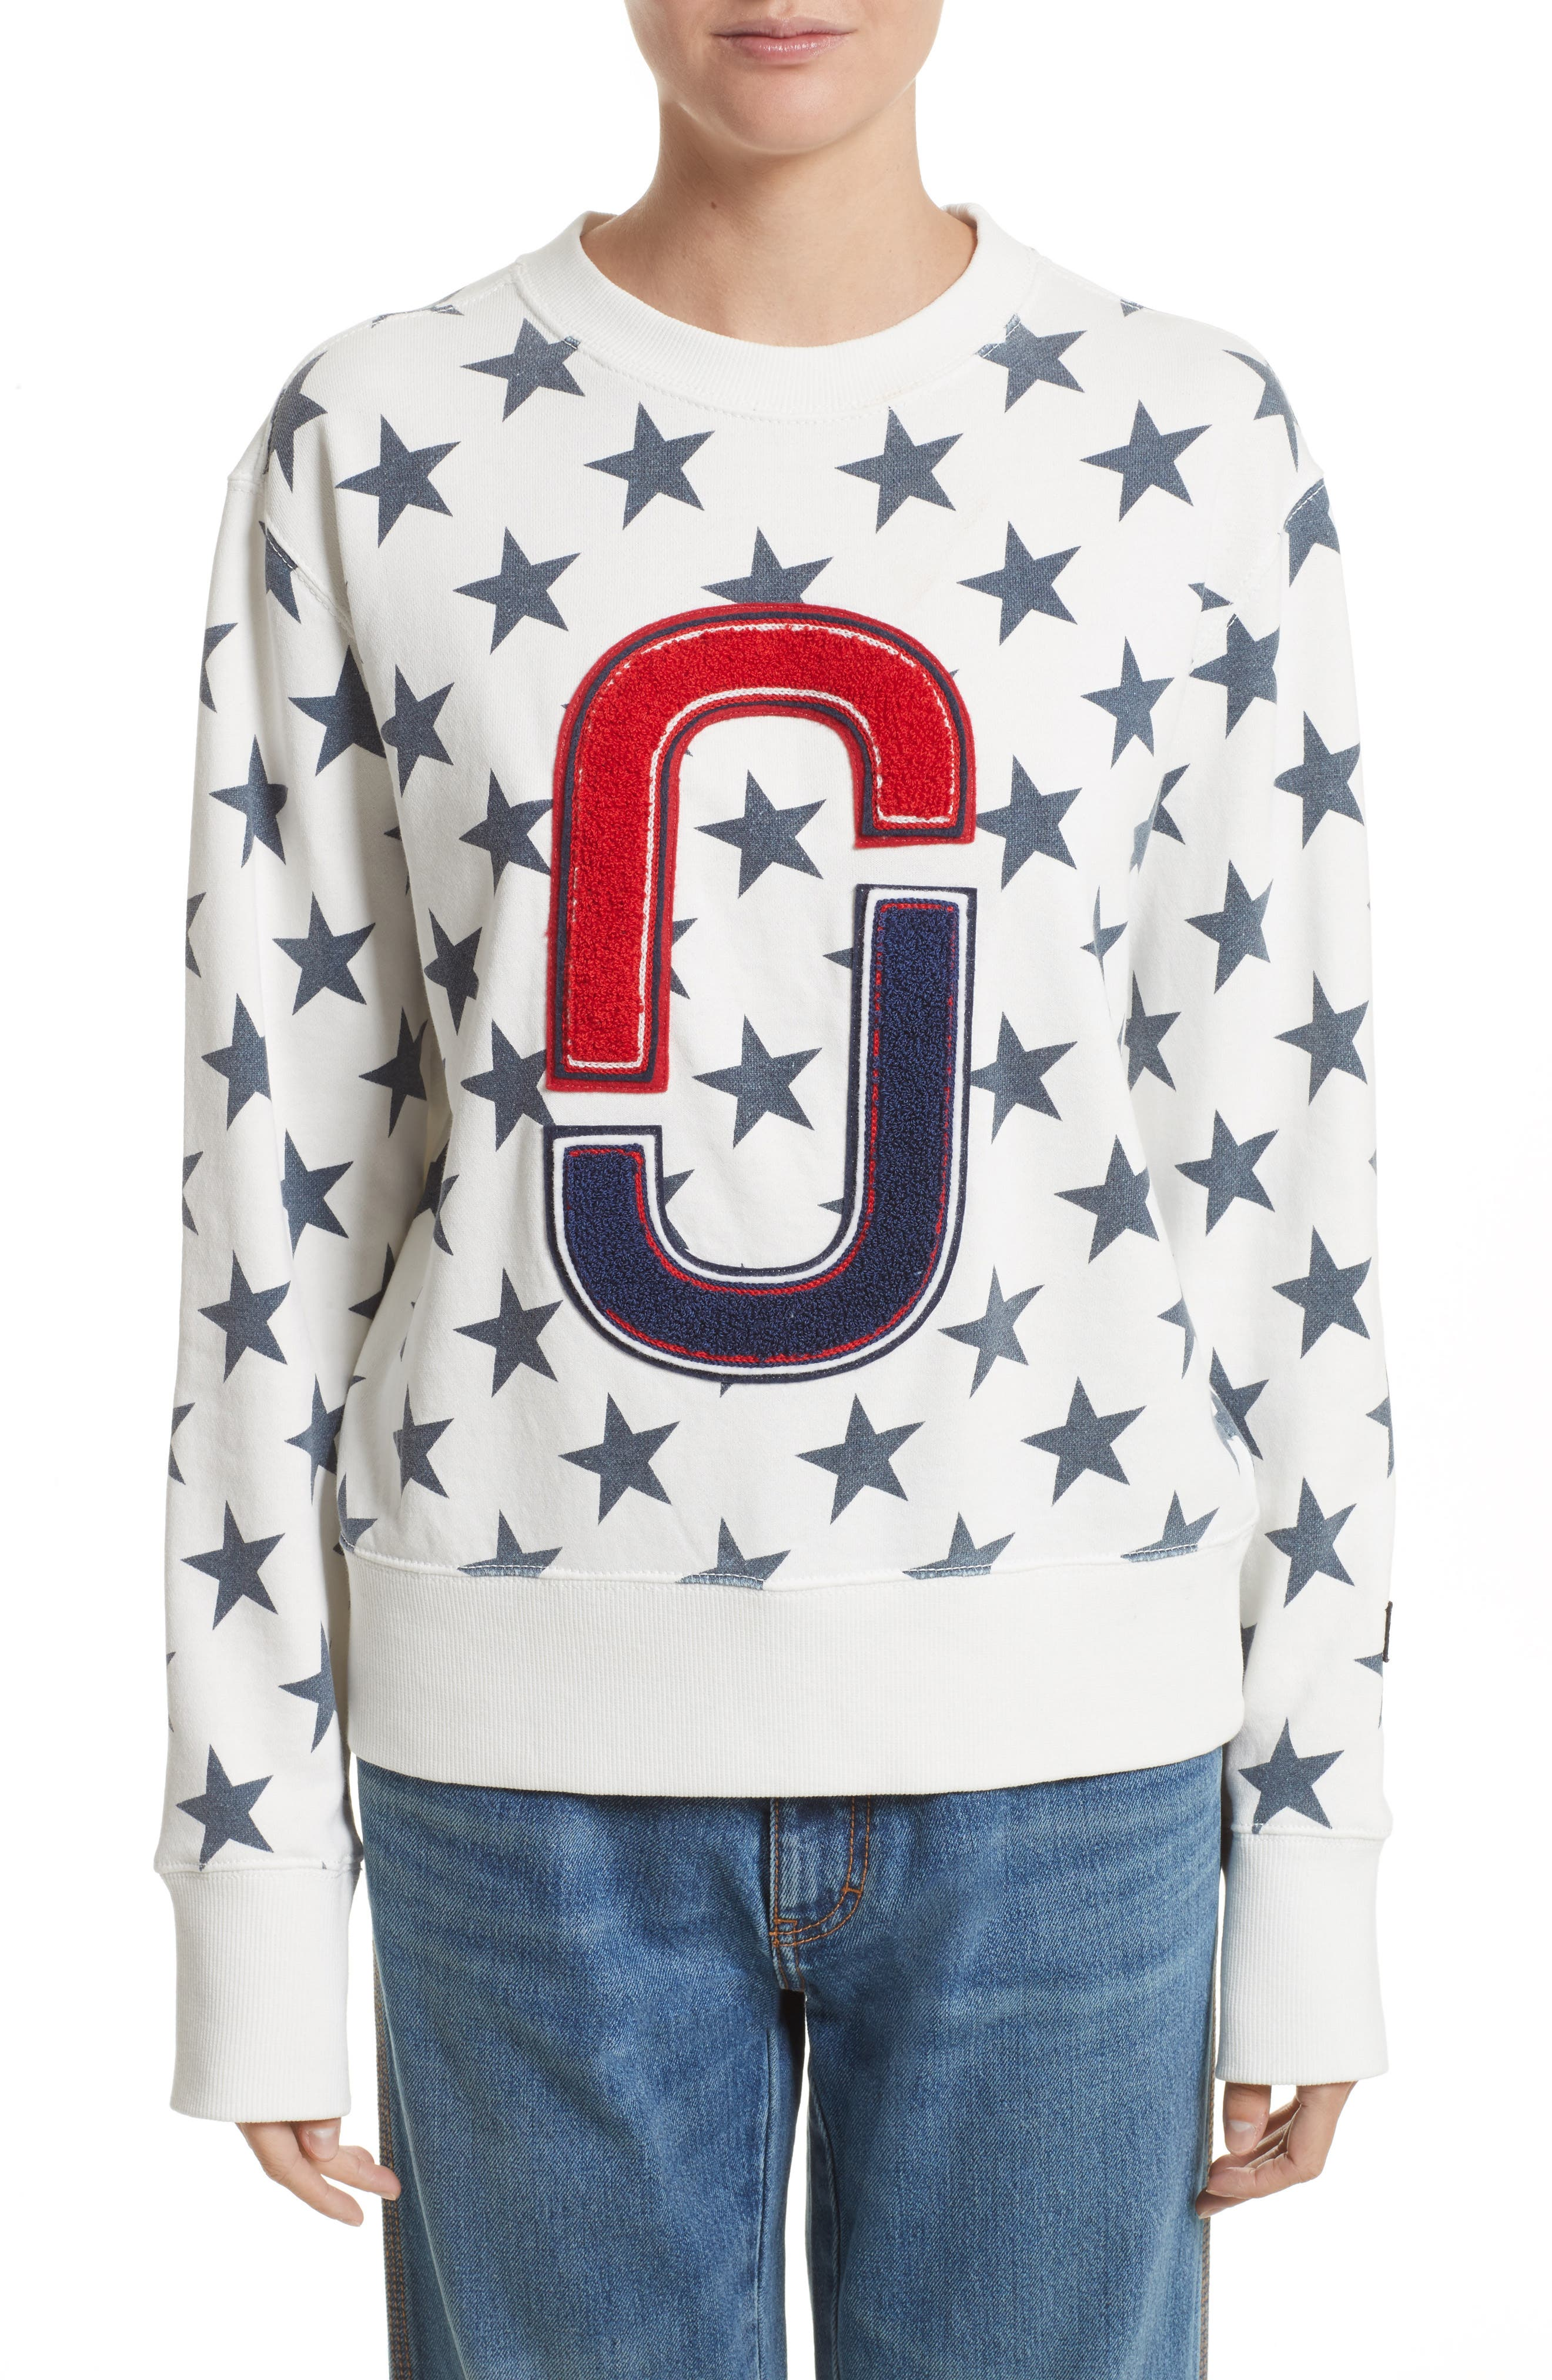 MARC JACOBS 90s Star Print Sweatshirt